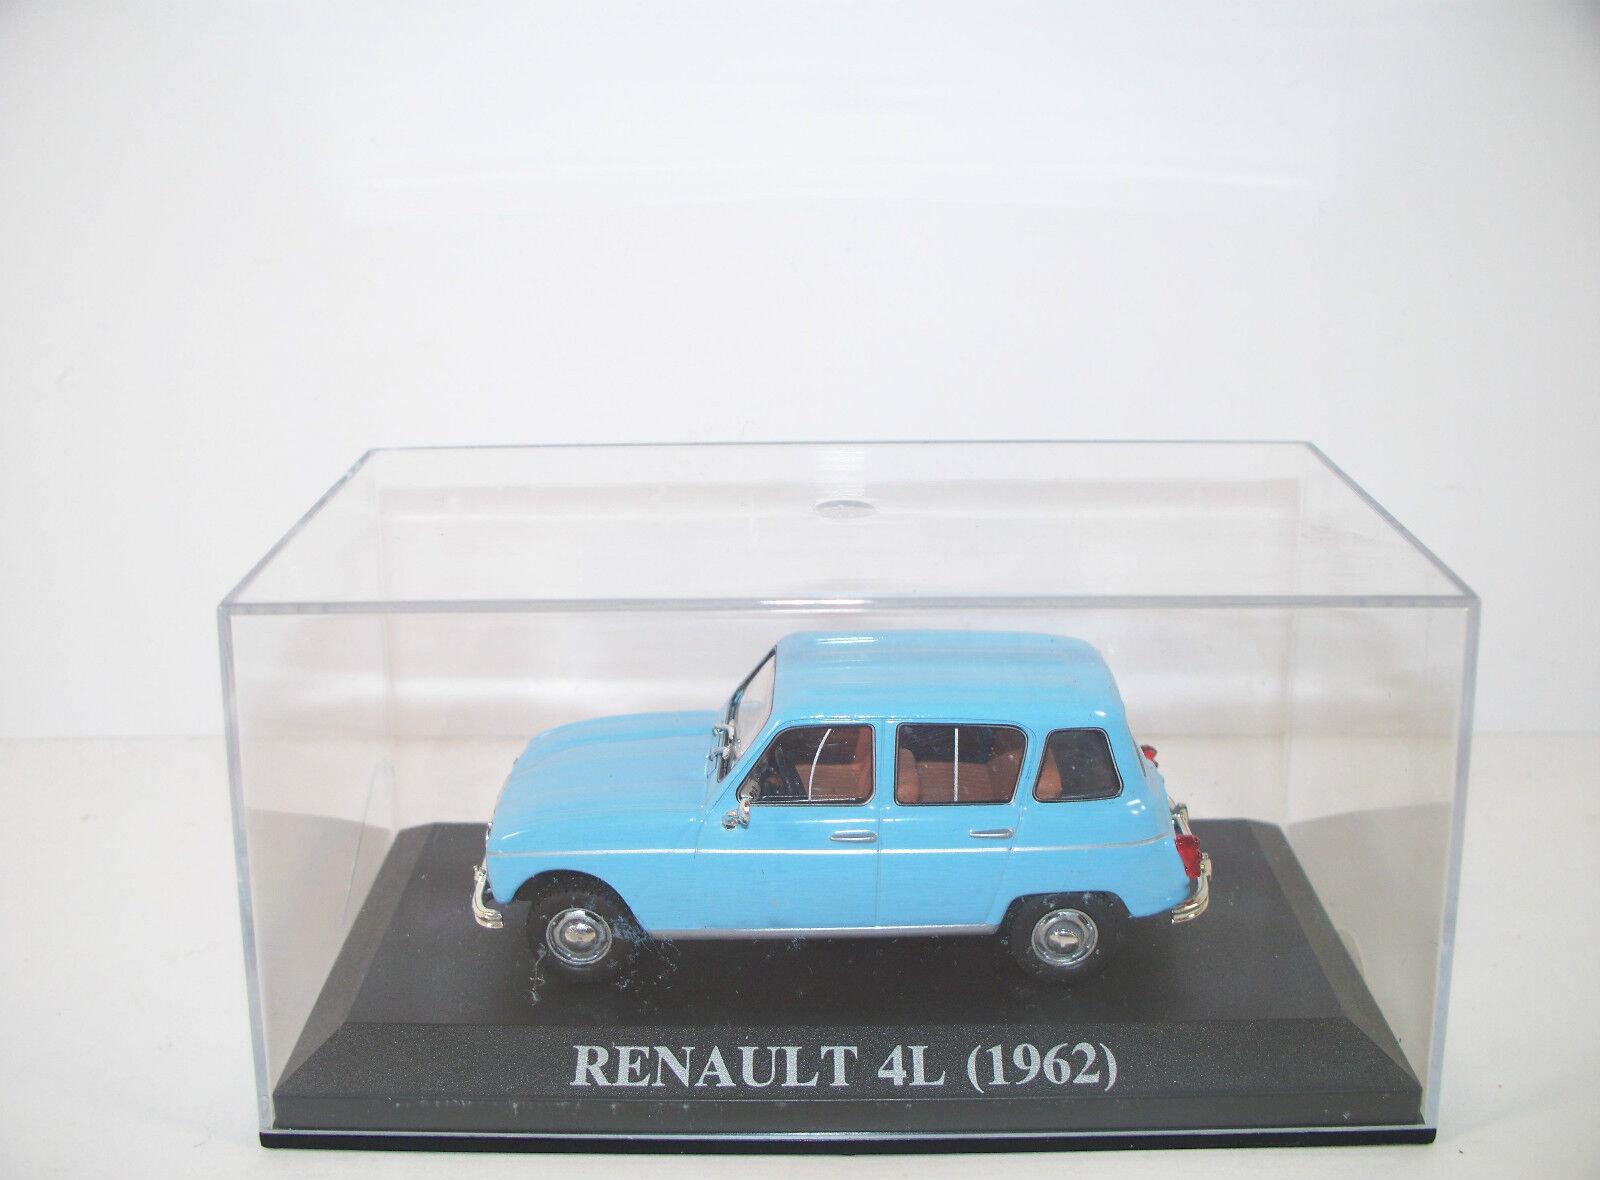 RENAULT 4L (1962) LIGHT blueE MINT BOXED 1 43